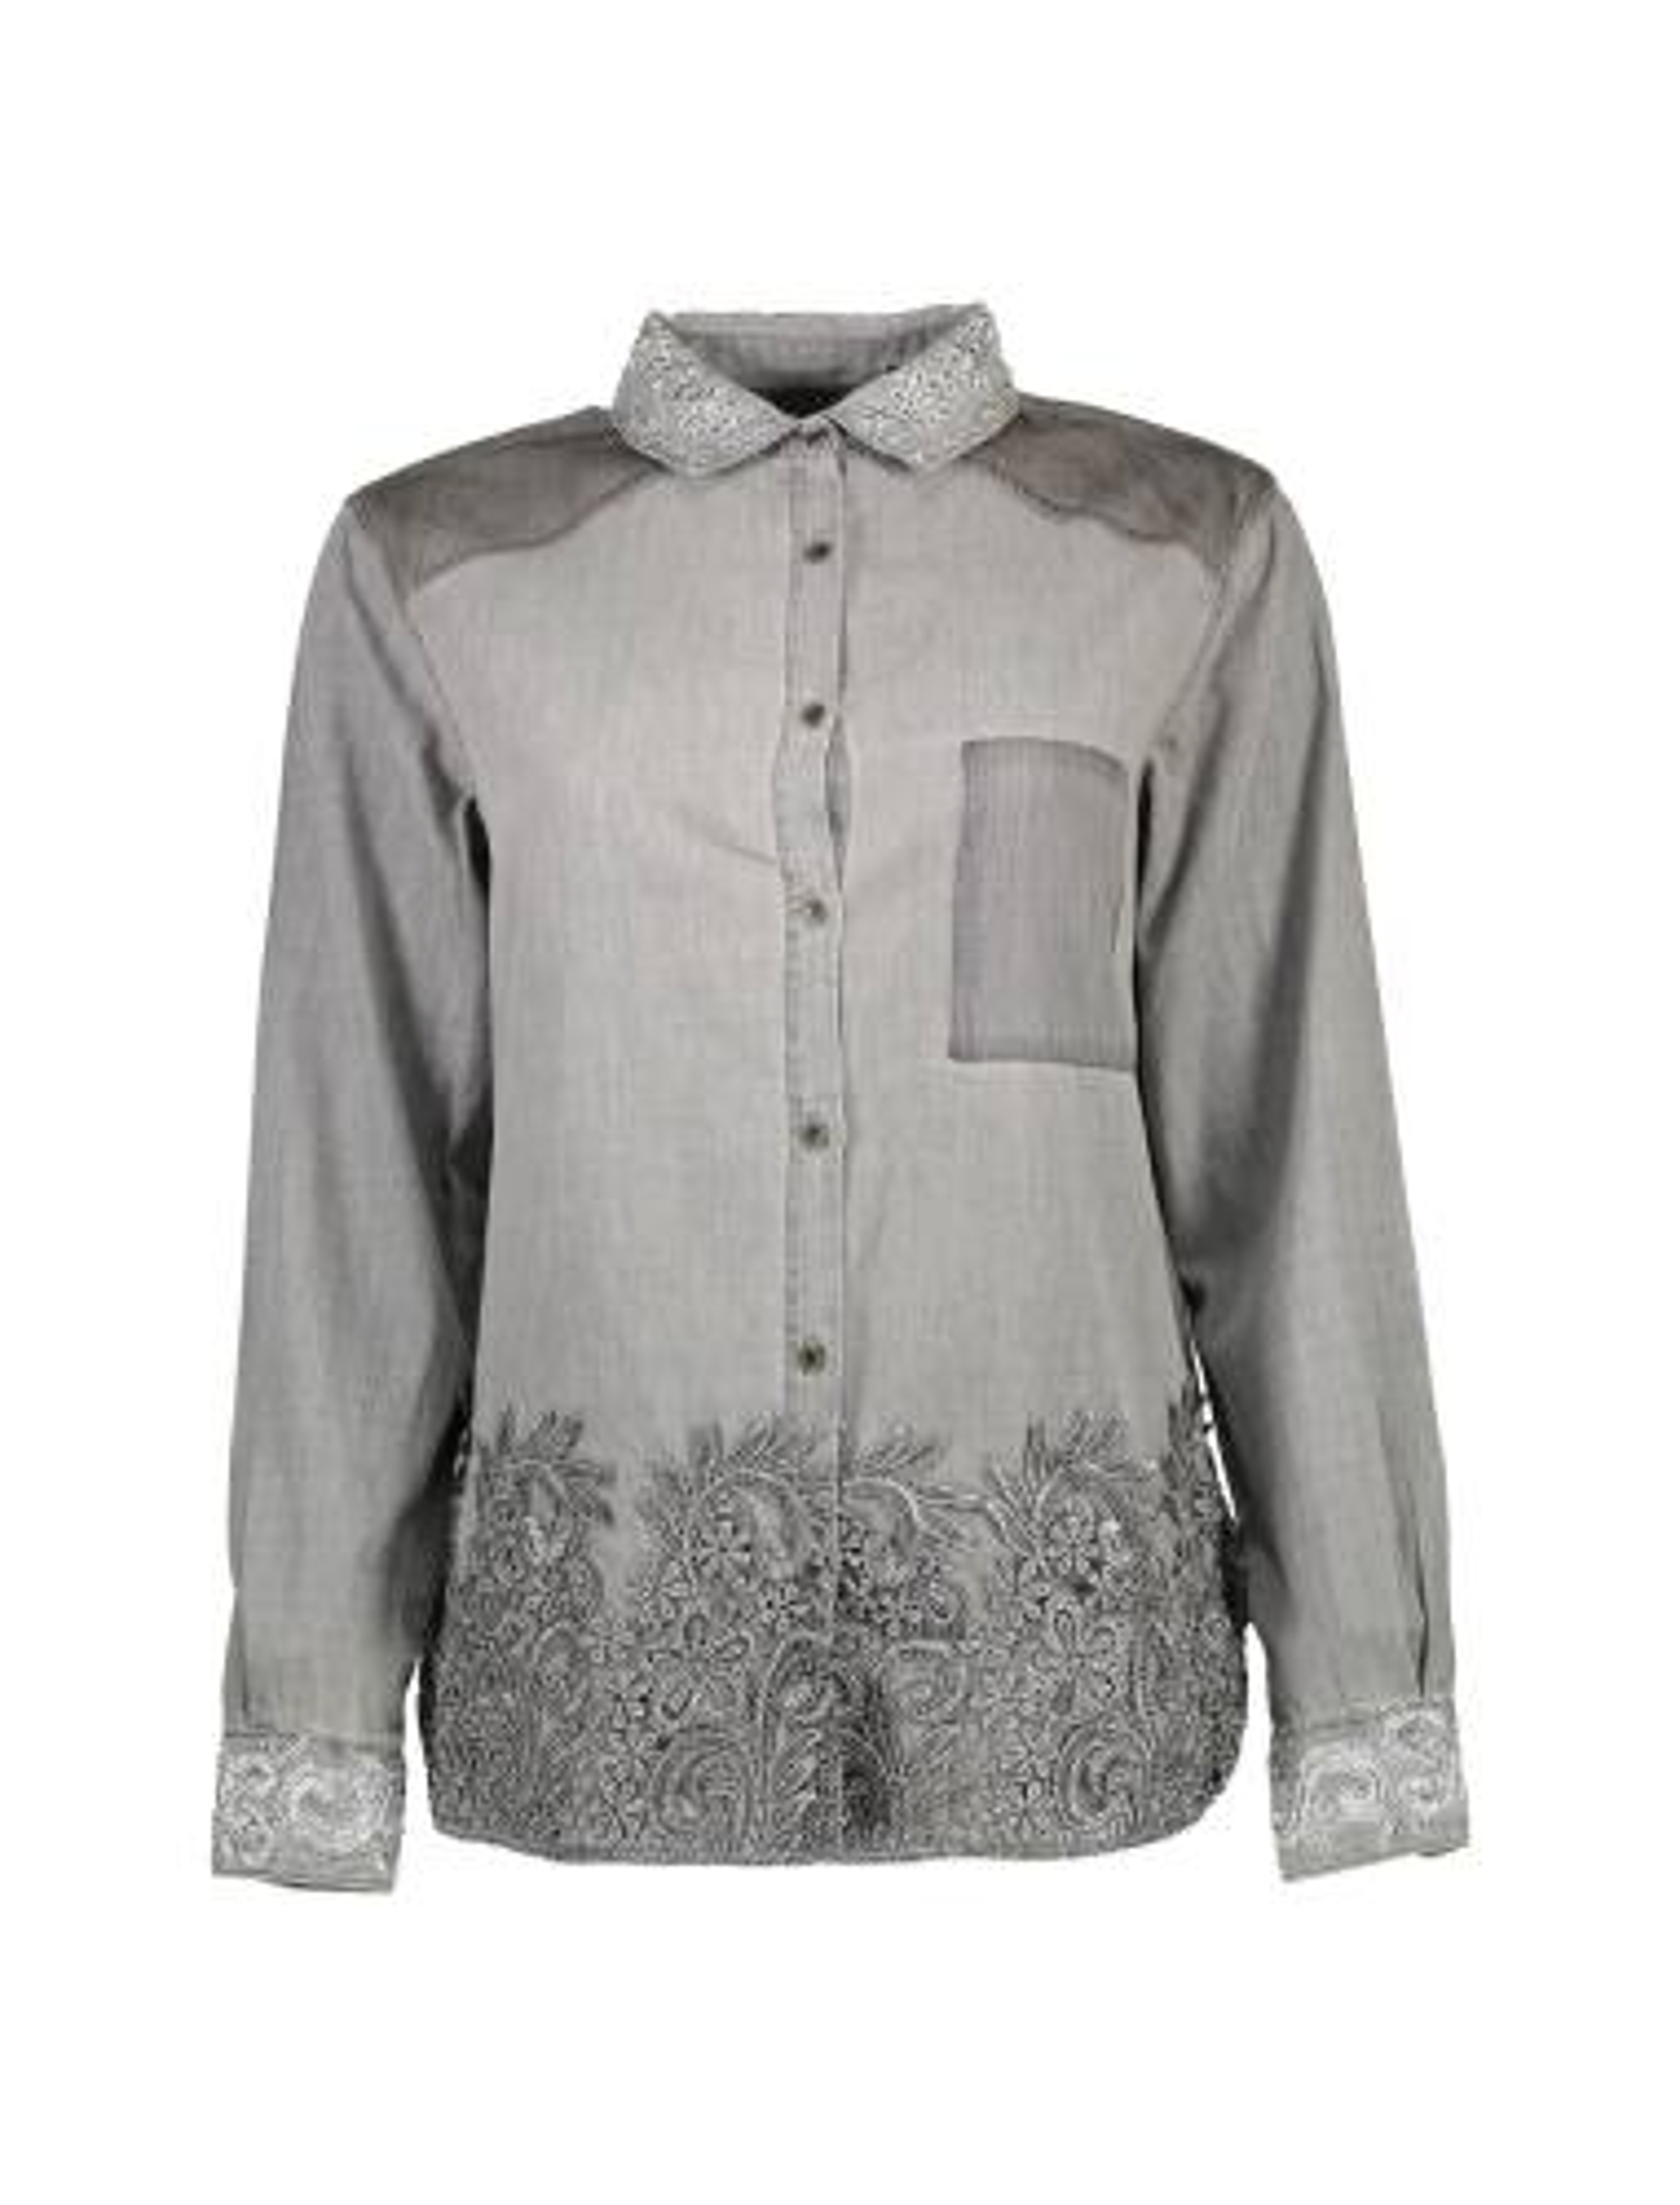 شومیز نخی آستین بلند زنانه Exotic Silver Shirt